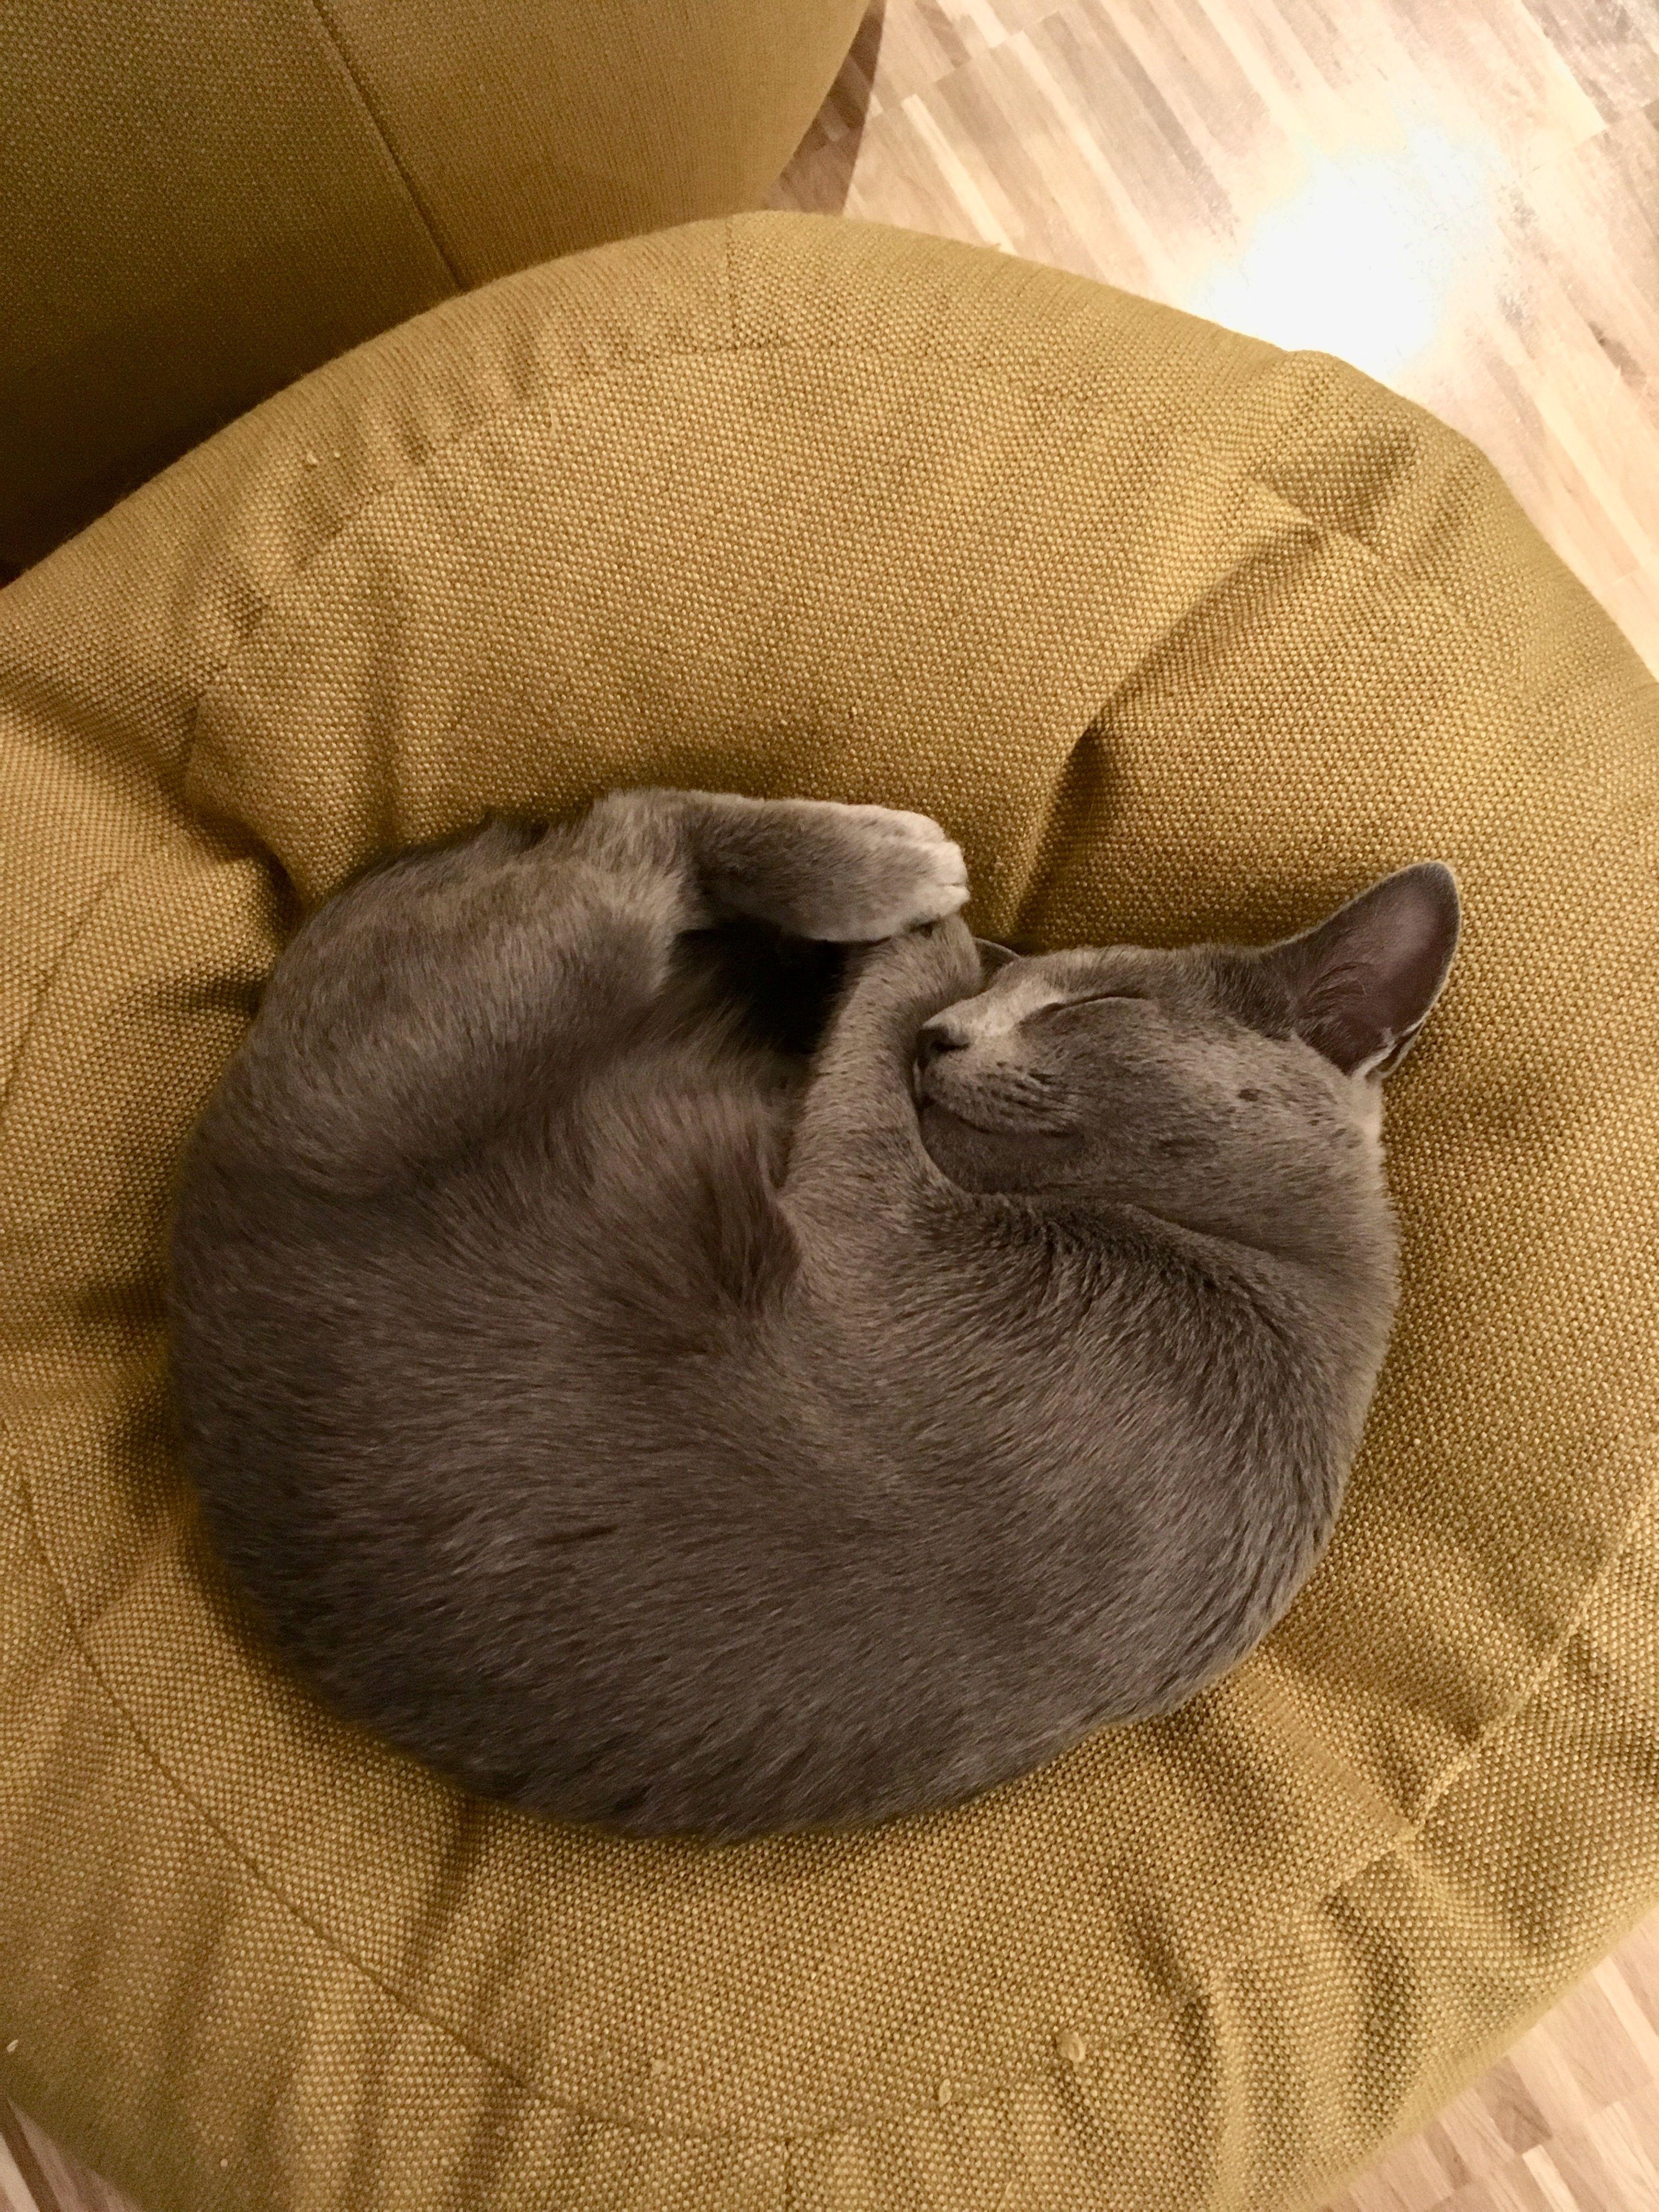 Pin By Lulu532 On Russisch Blau Russian Blue Cat Grey Cats Russian Blue